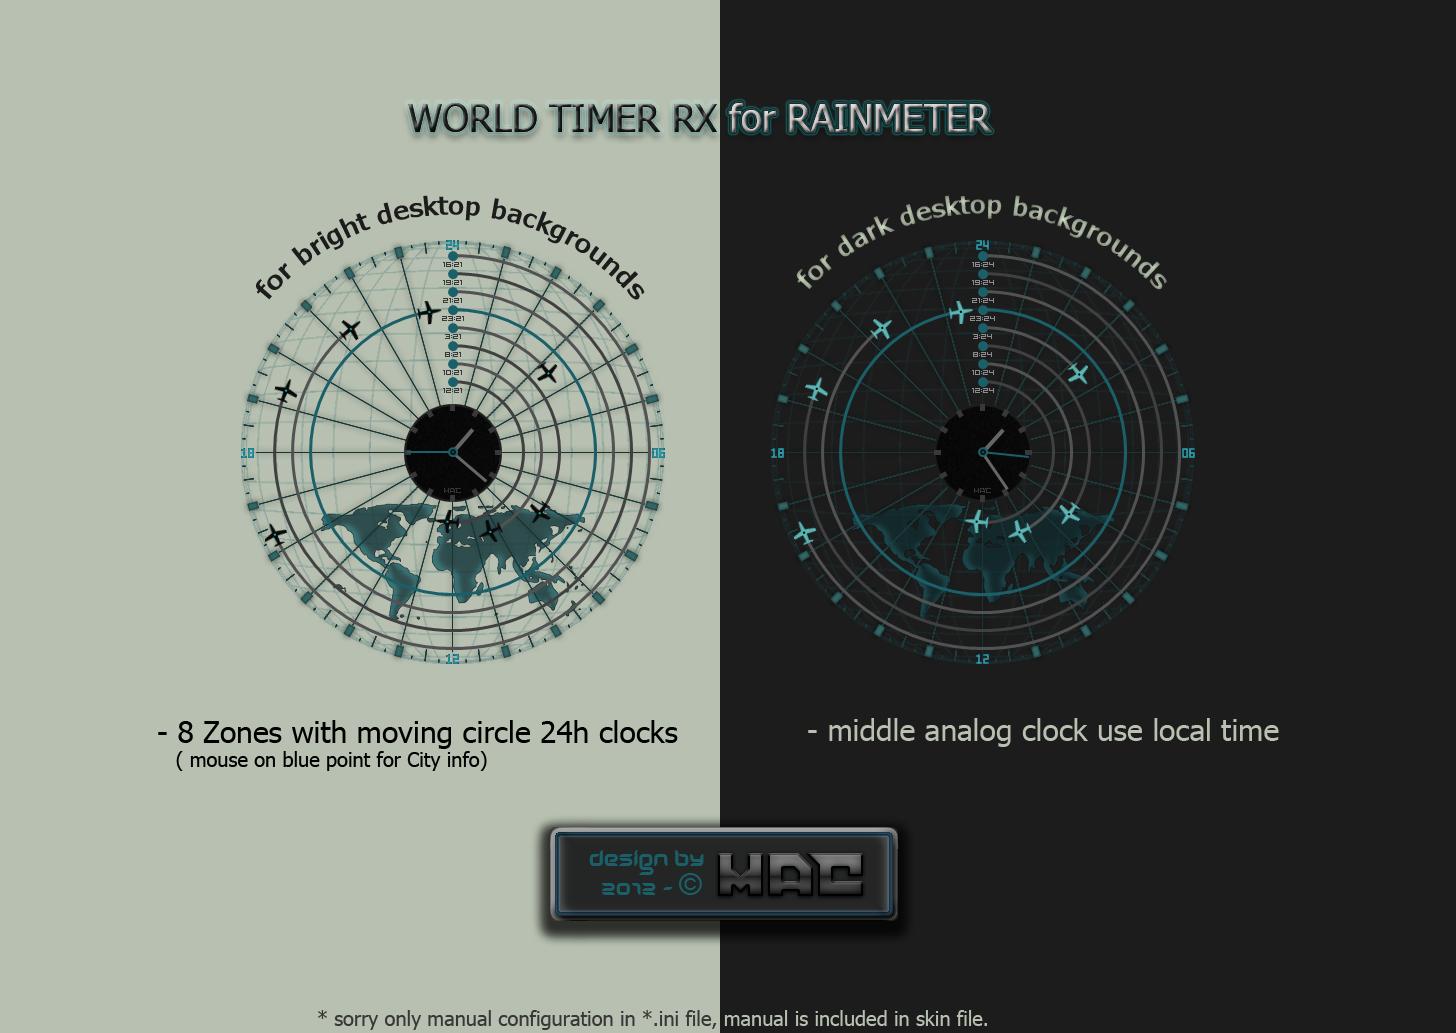 World Timer RX Radar (Rainmeter) by d4fmac